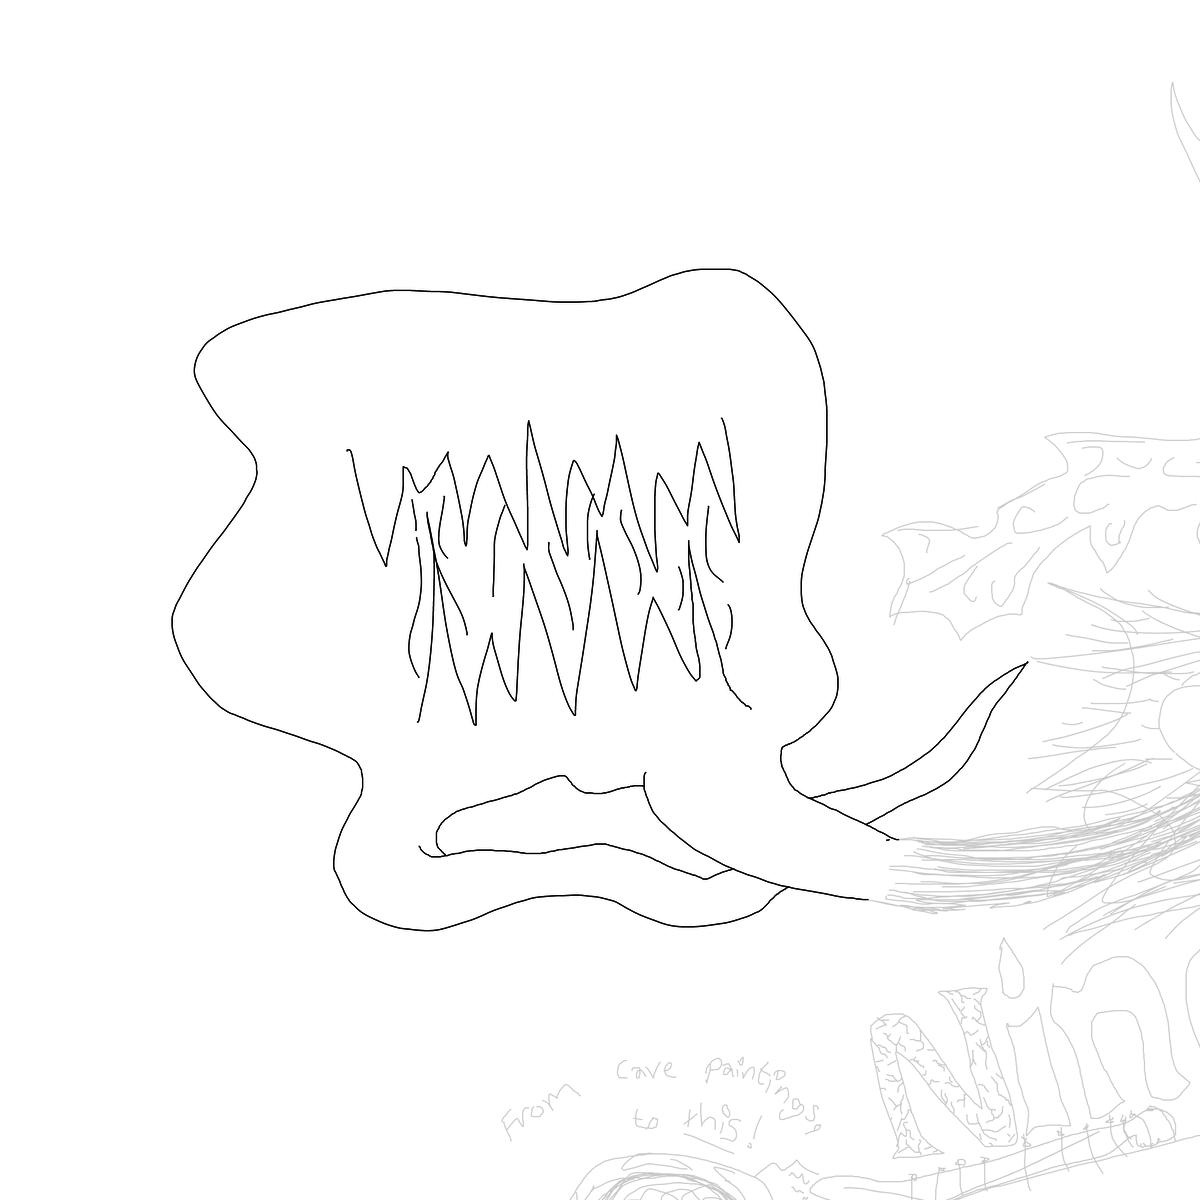 BAAAM drawing#23932 lat:78.4174728393554700lng: -4.4293603897094730